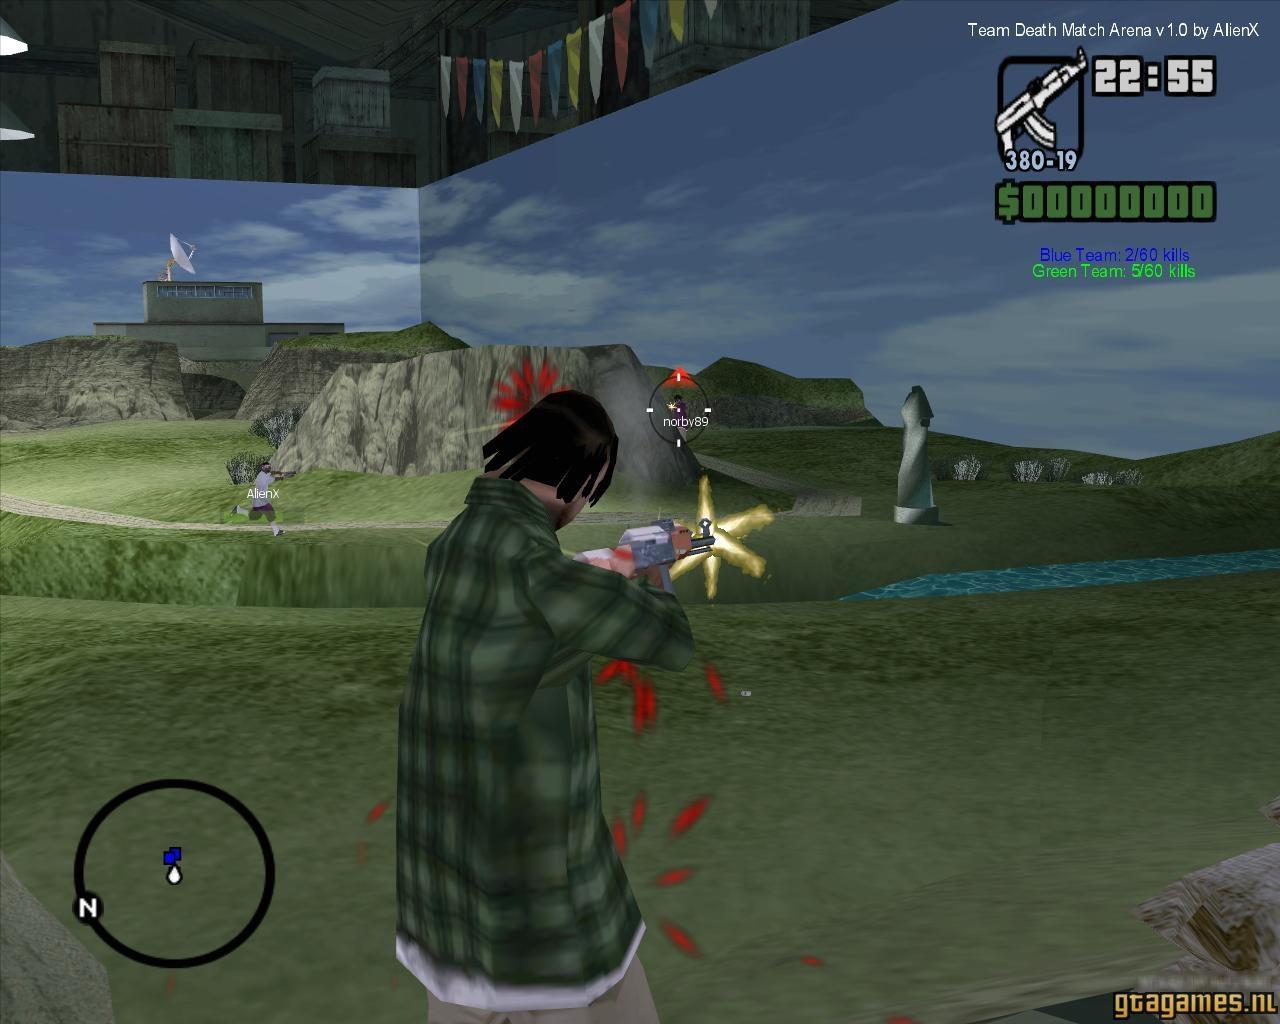 Team Deathmatch 02